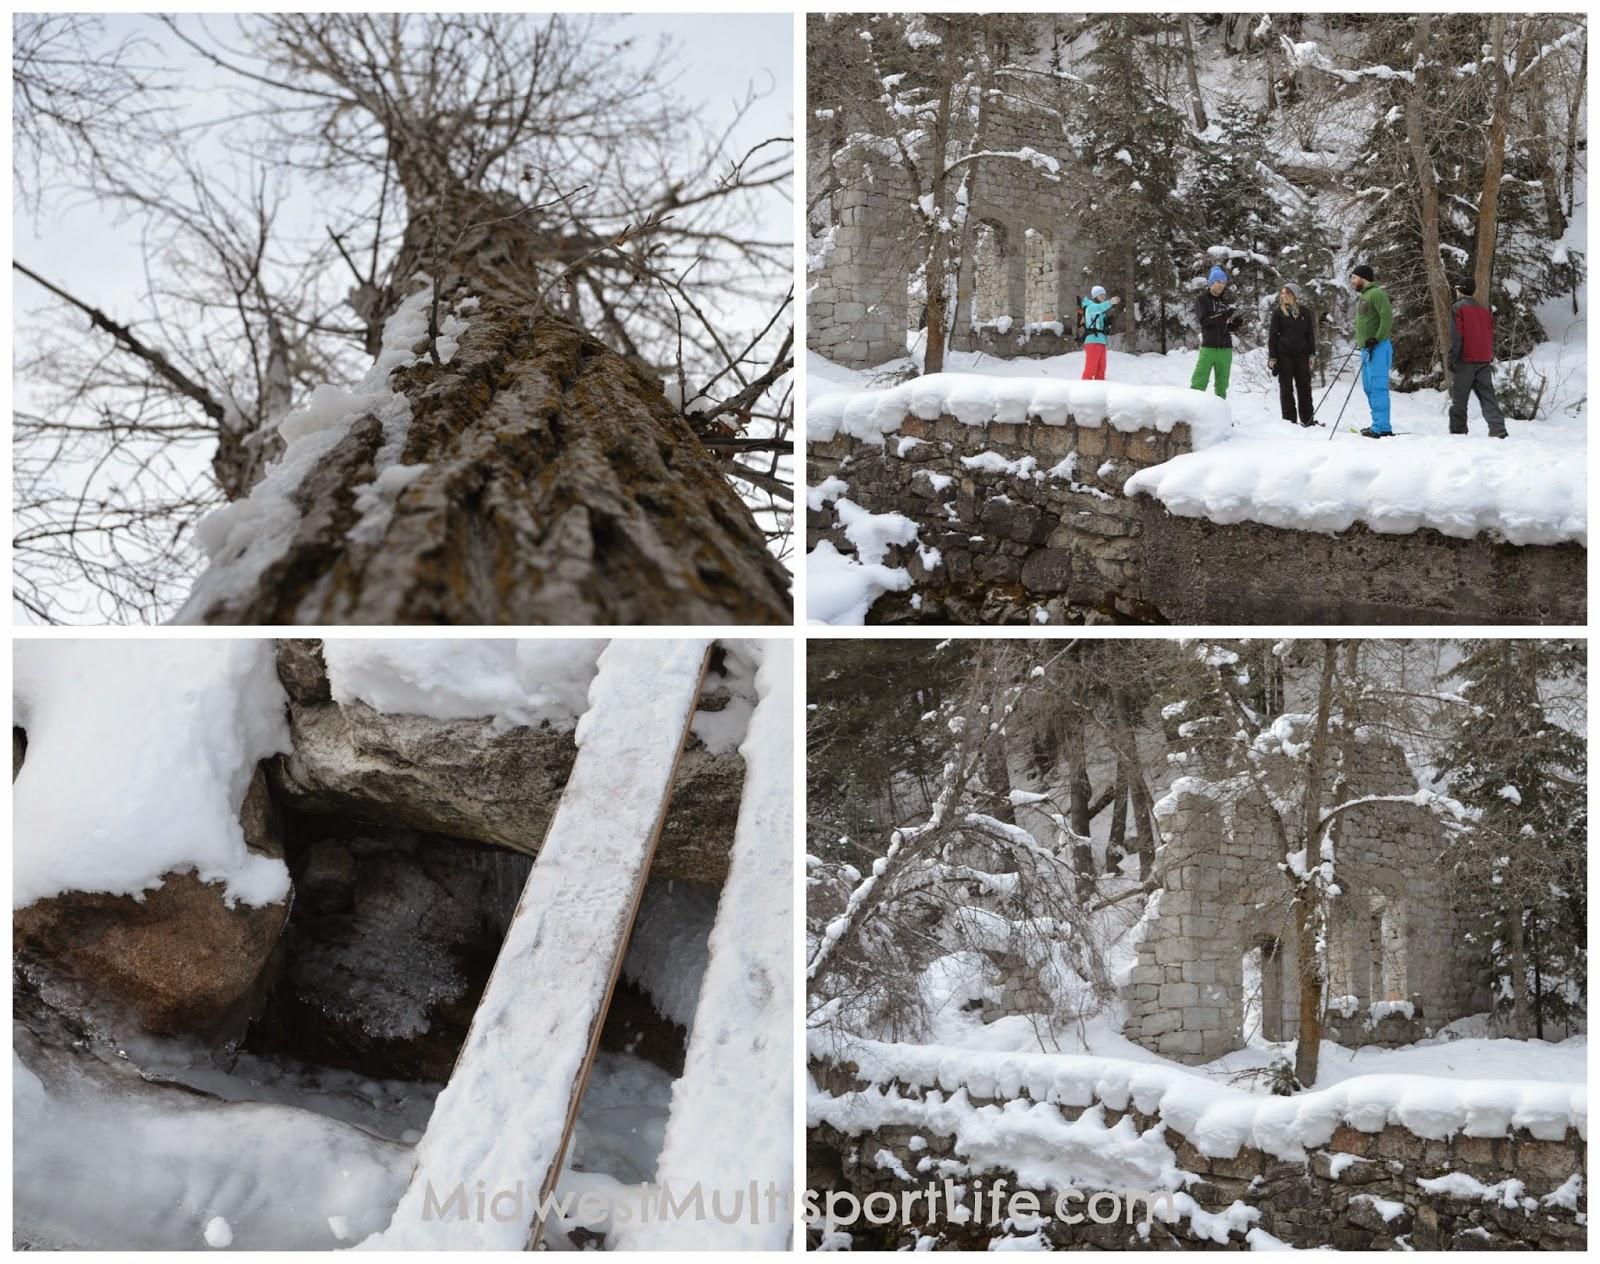 #Hikerchat Snowshoe